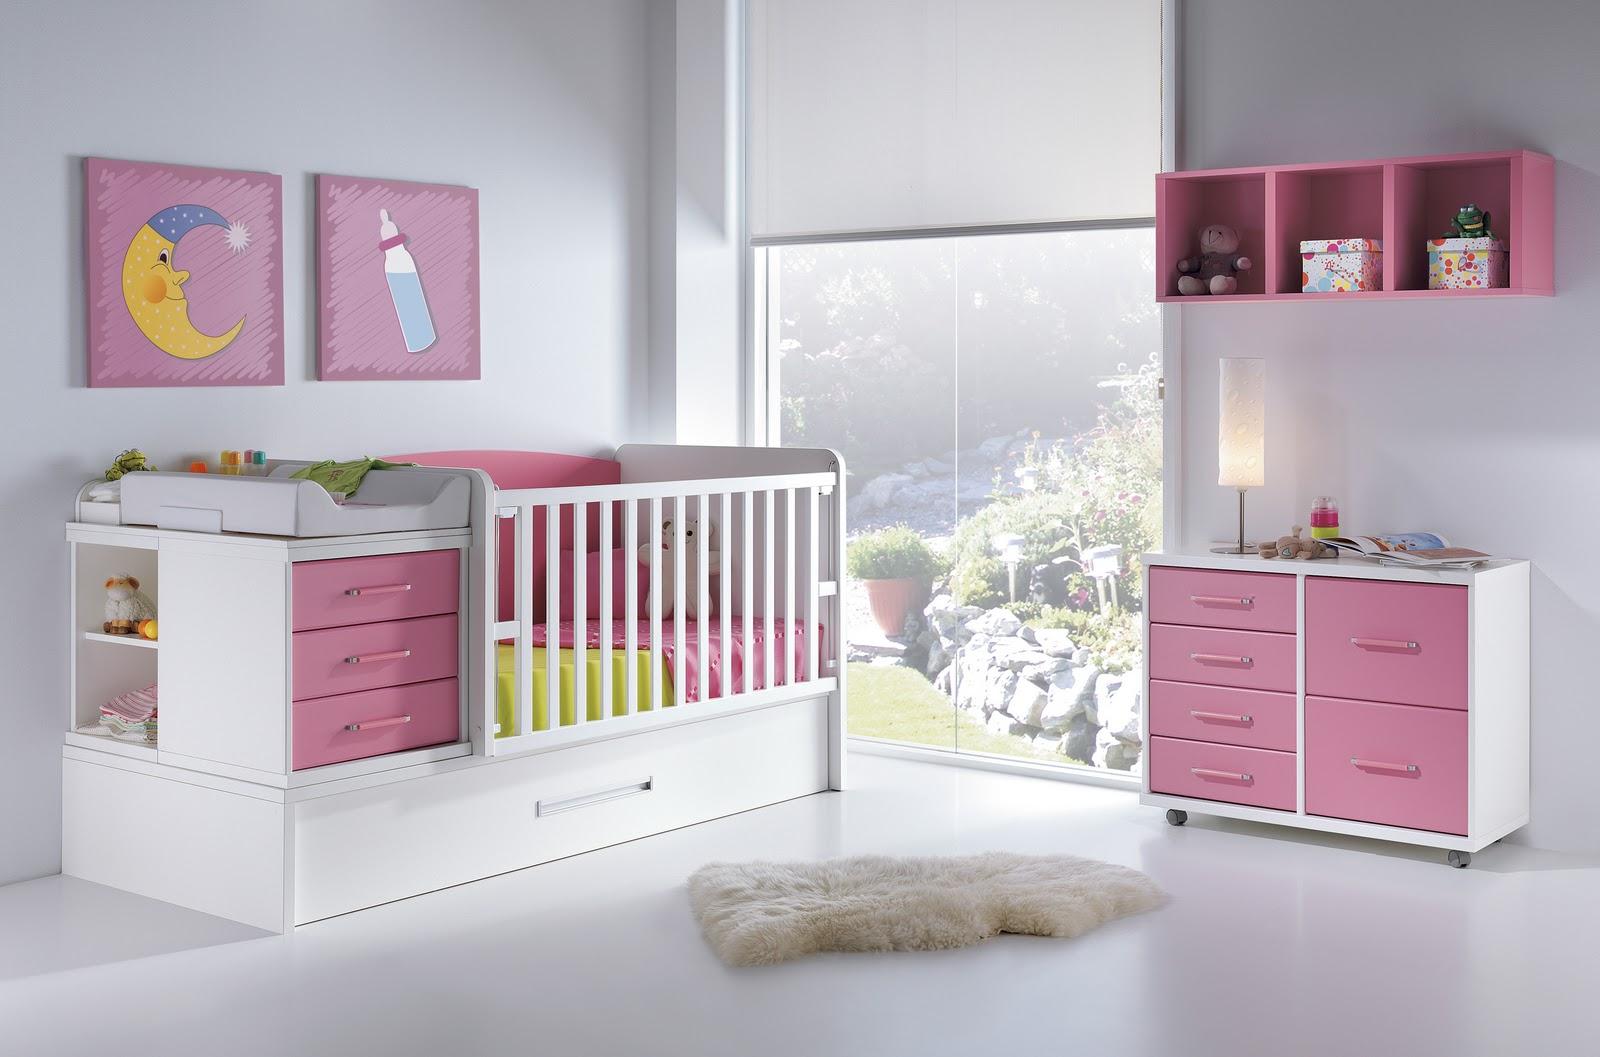 Consejos decoraci n hogar habitaci n infantil cuna for Consejos decoracion hogar